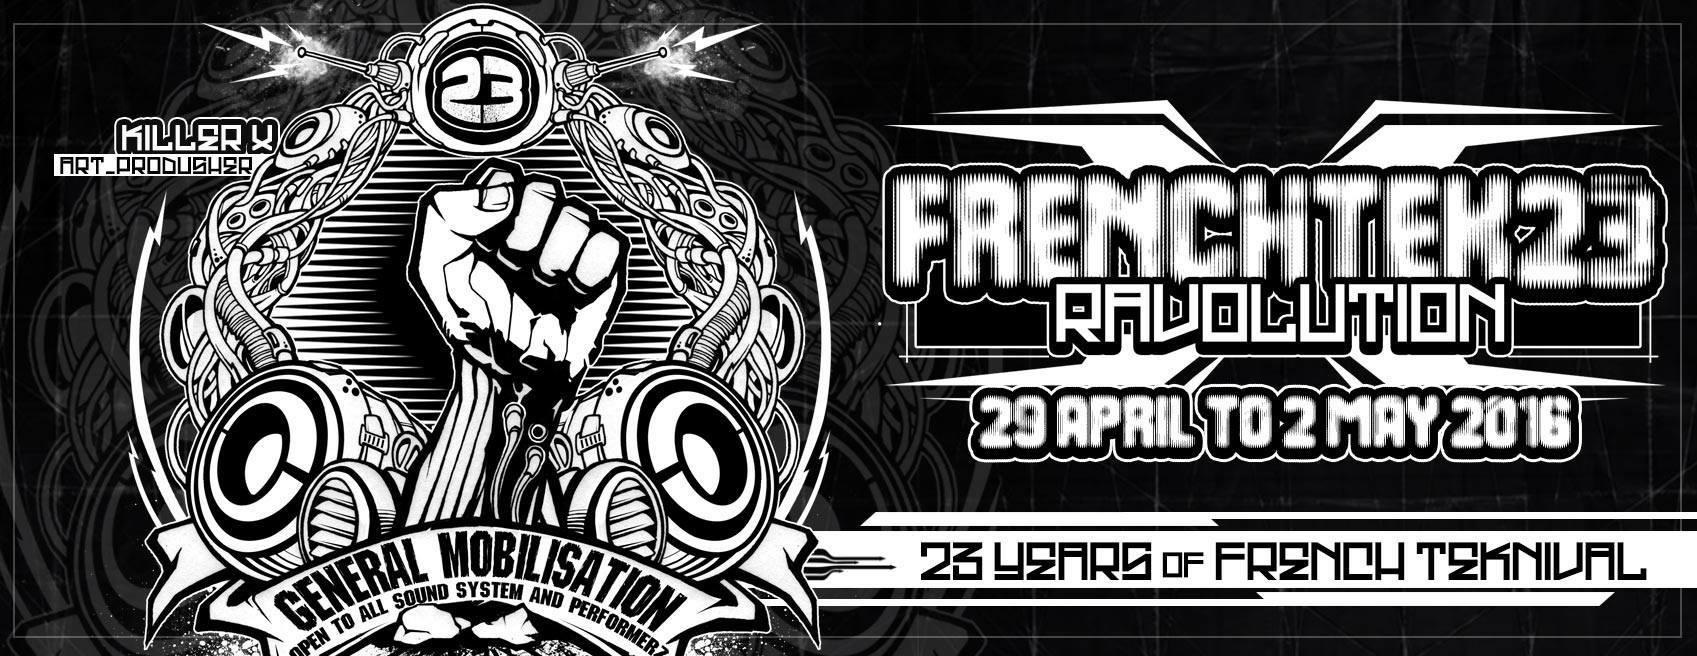 RaveOlution 23 : un teknival revendicatif non négociable du 29 avril au 2 mai